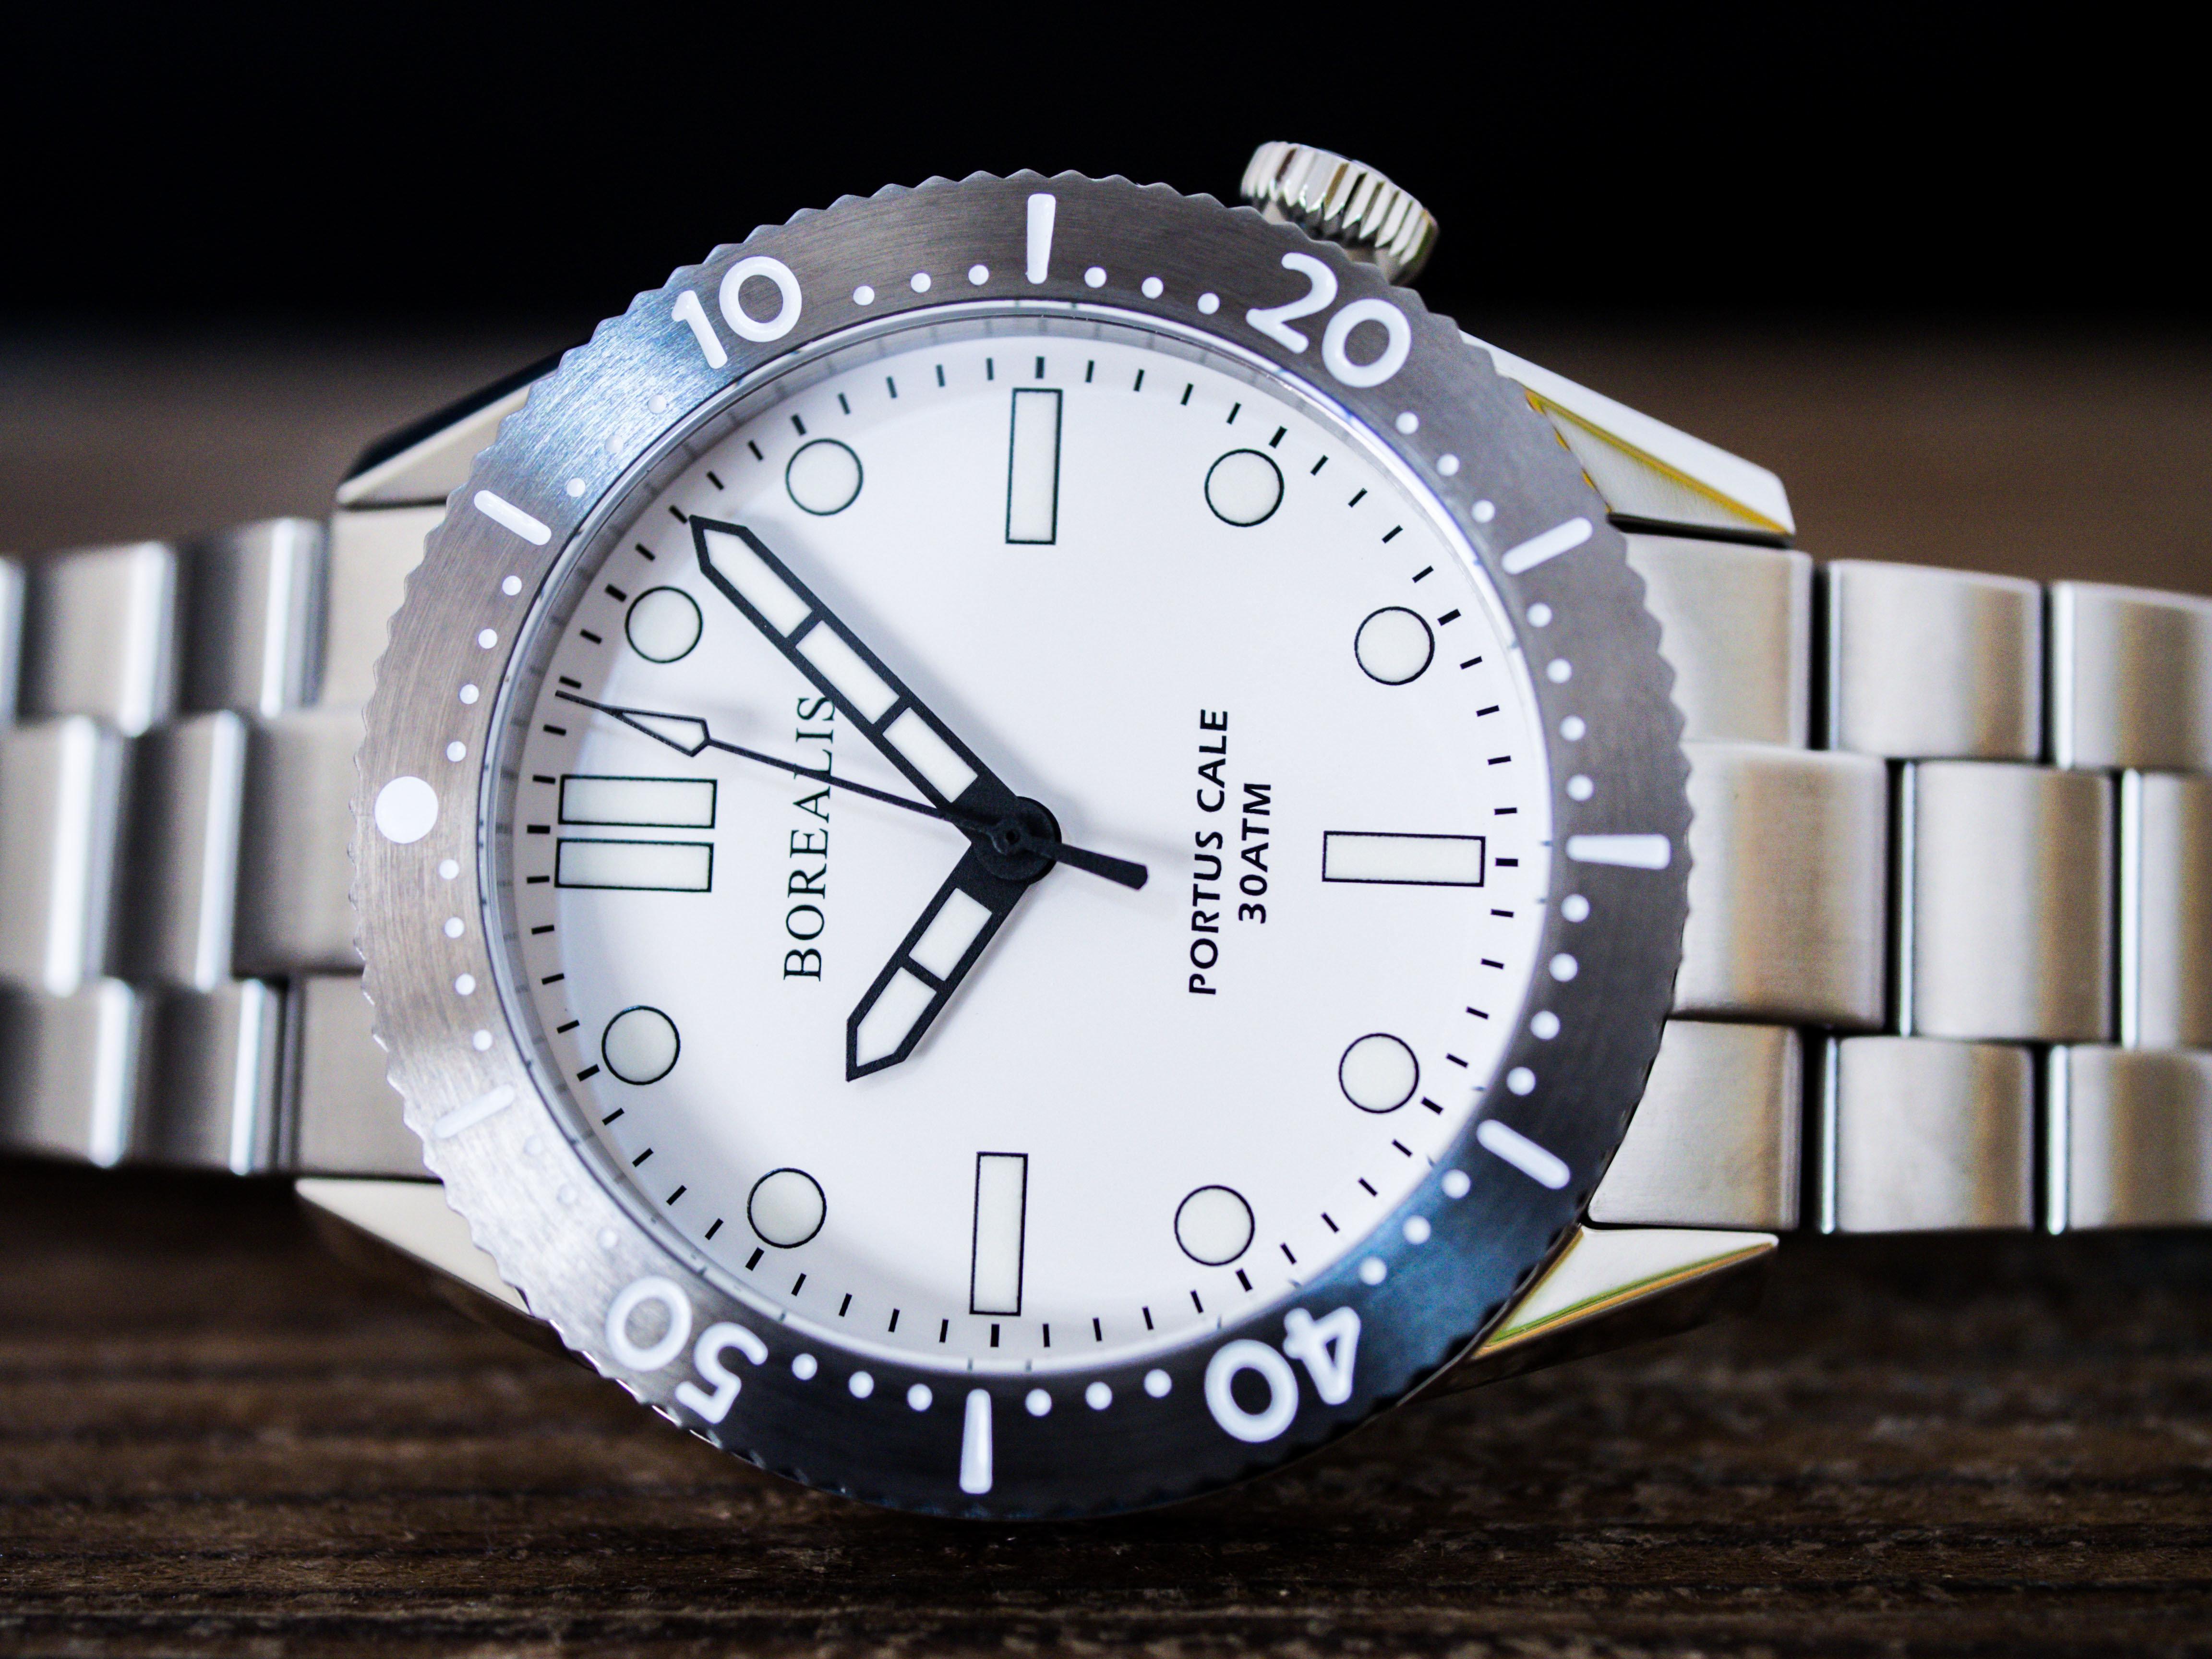 Borealis Portus Cale White Version A1 Dial SLWL No Date